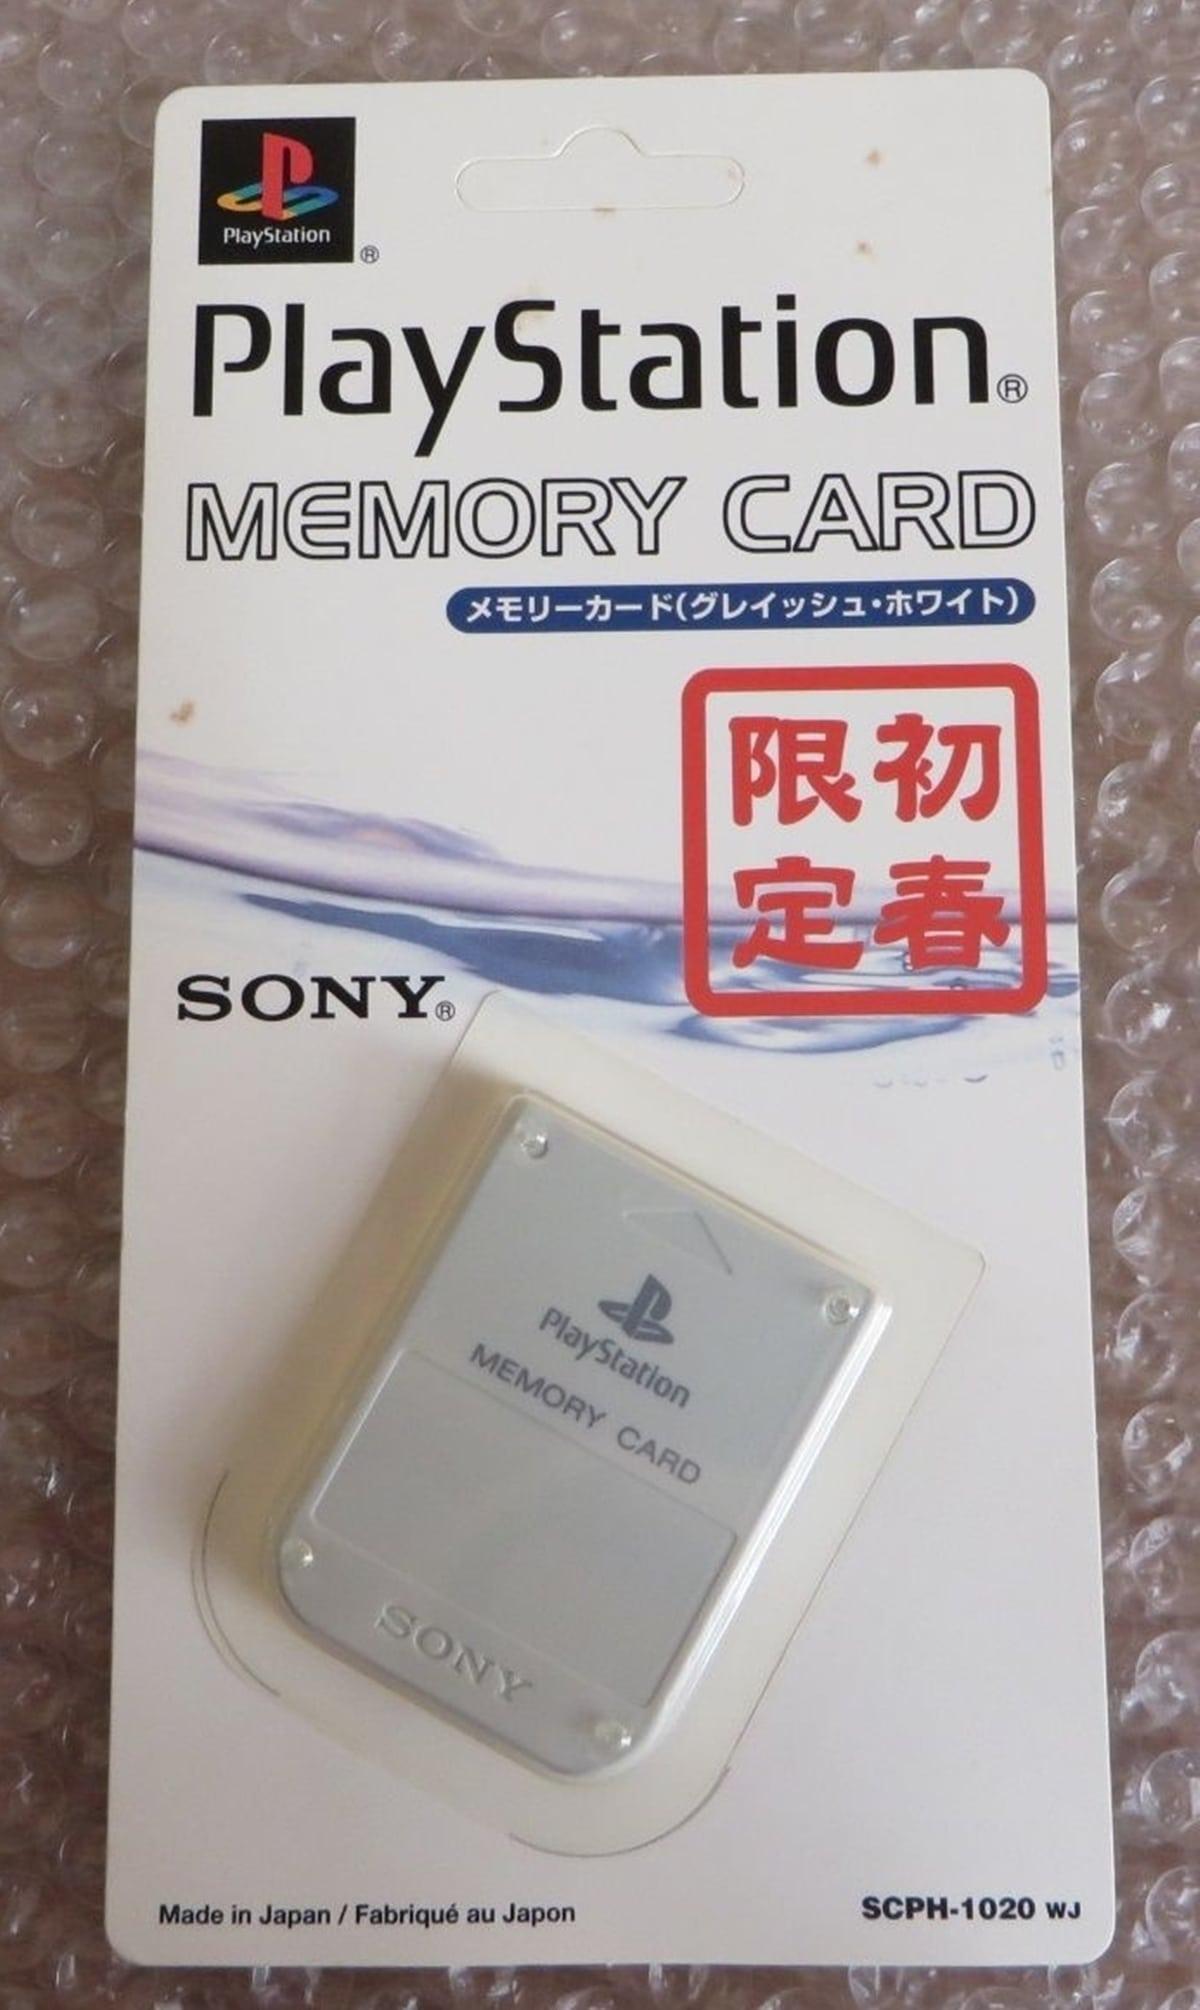 memory card scph 1020wj 031 - [SCPH-1020] Memory Card / Karta pamięci